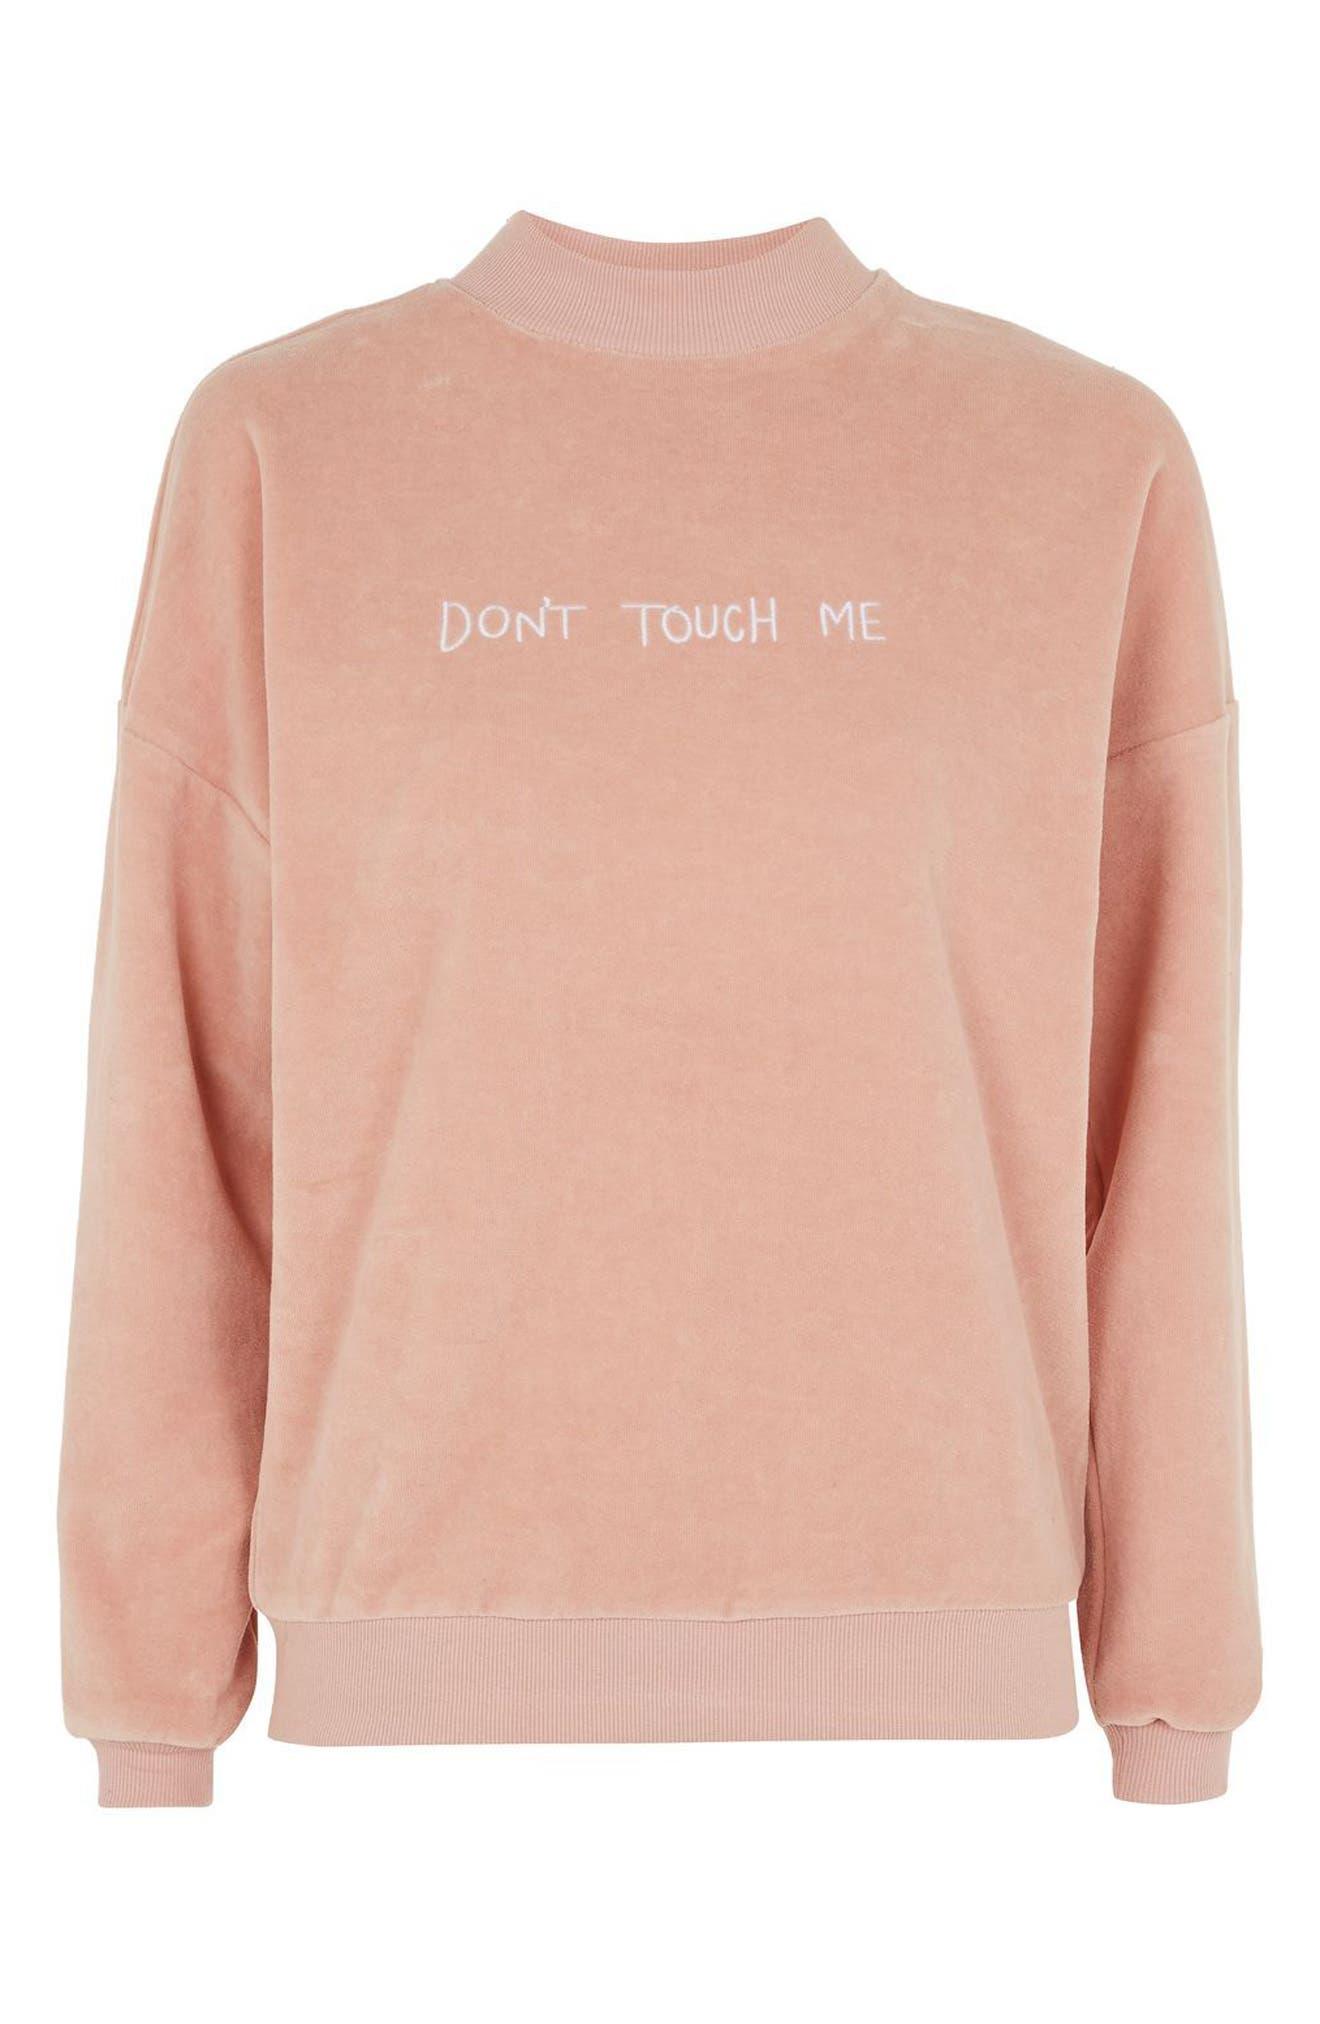 Alternate Image 4  - Topshop by Tee & Cake Don't Touch Me Velvet Sweatshirt